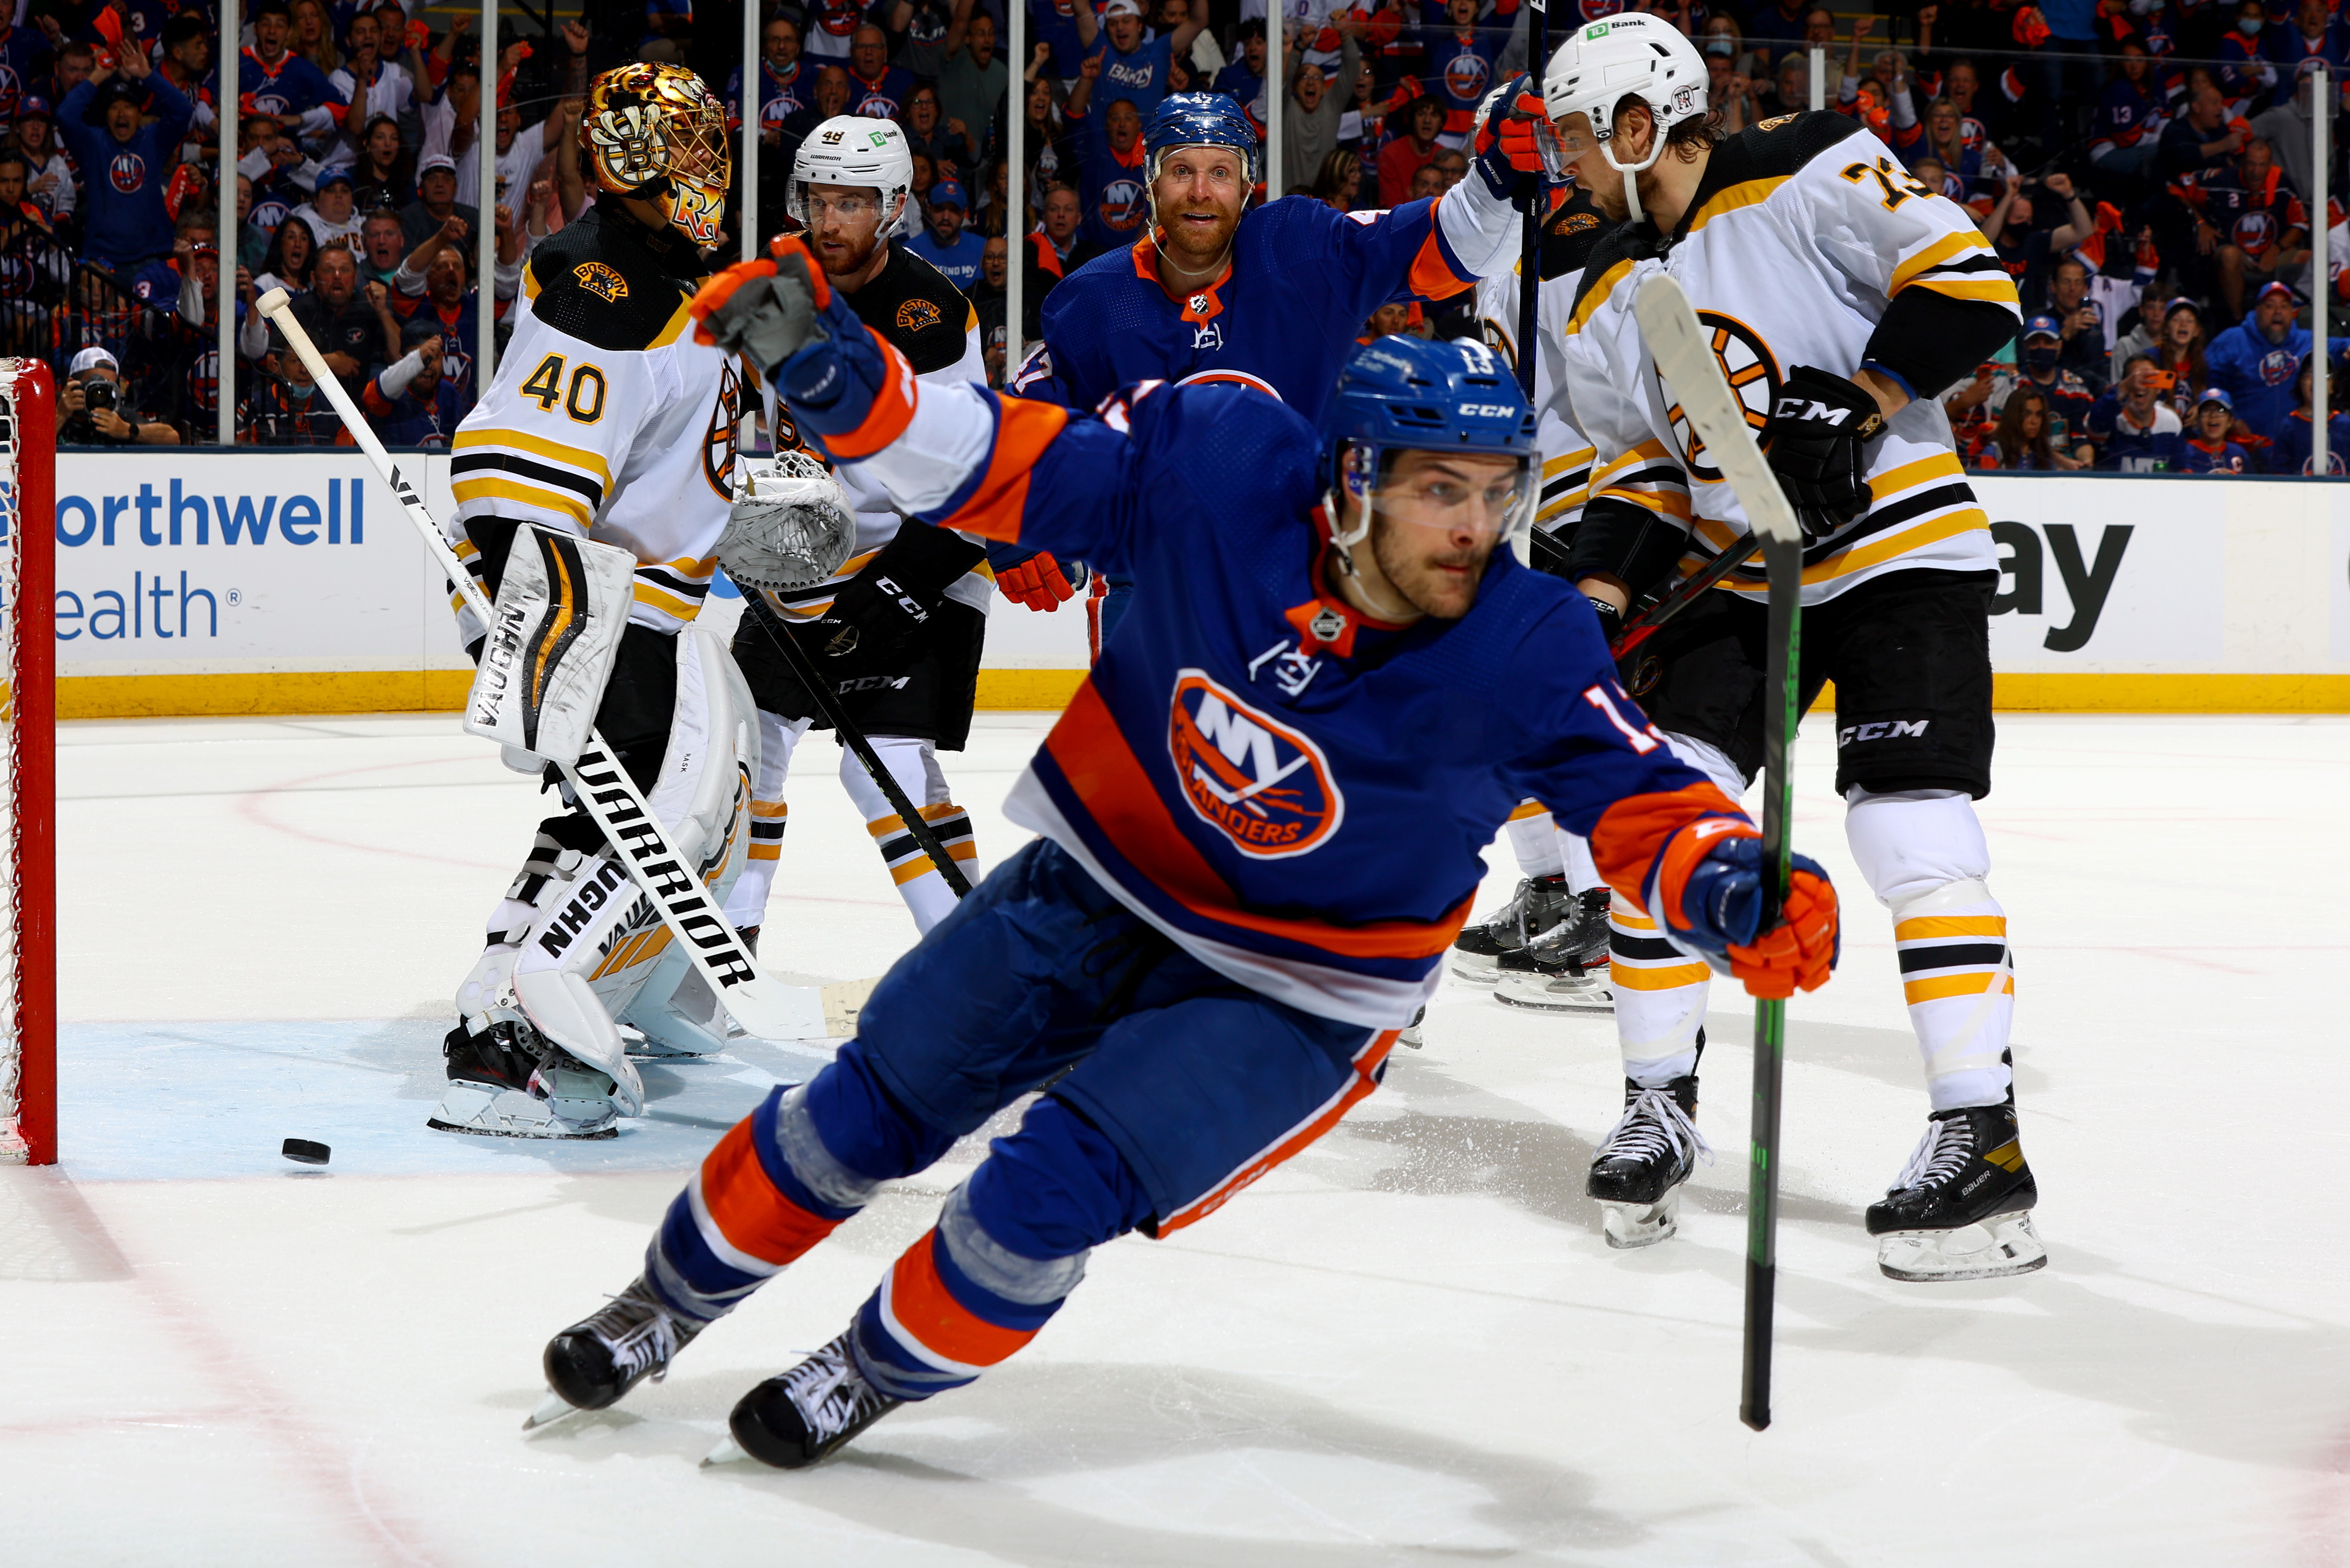 <p>Kyle Palmieri, Islanders Beat Bruins 4-1 in Game 4 to Even Series thumbnail